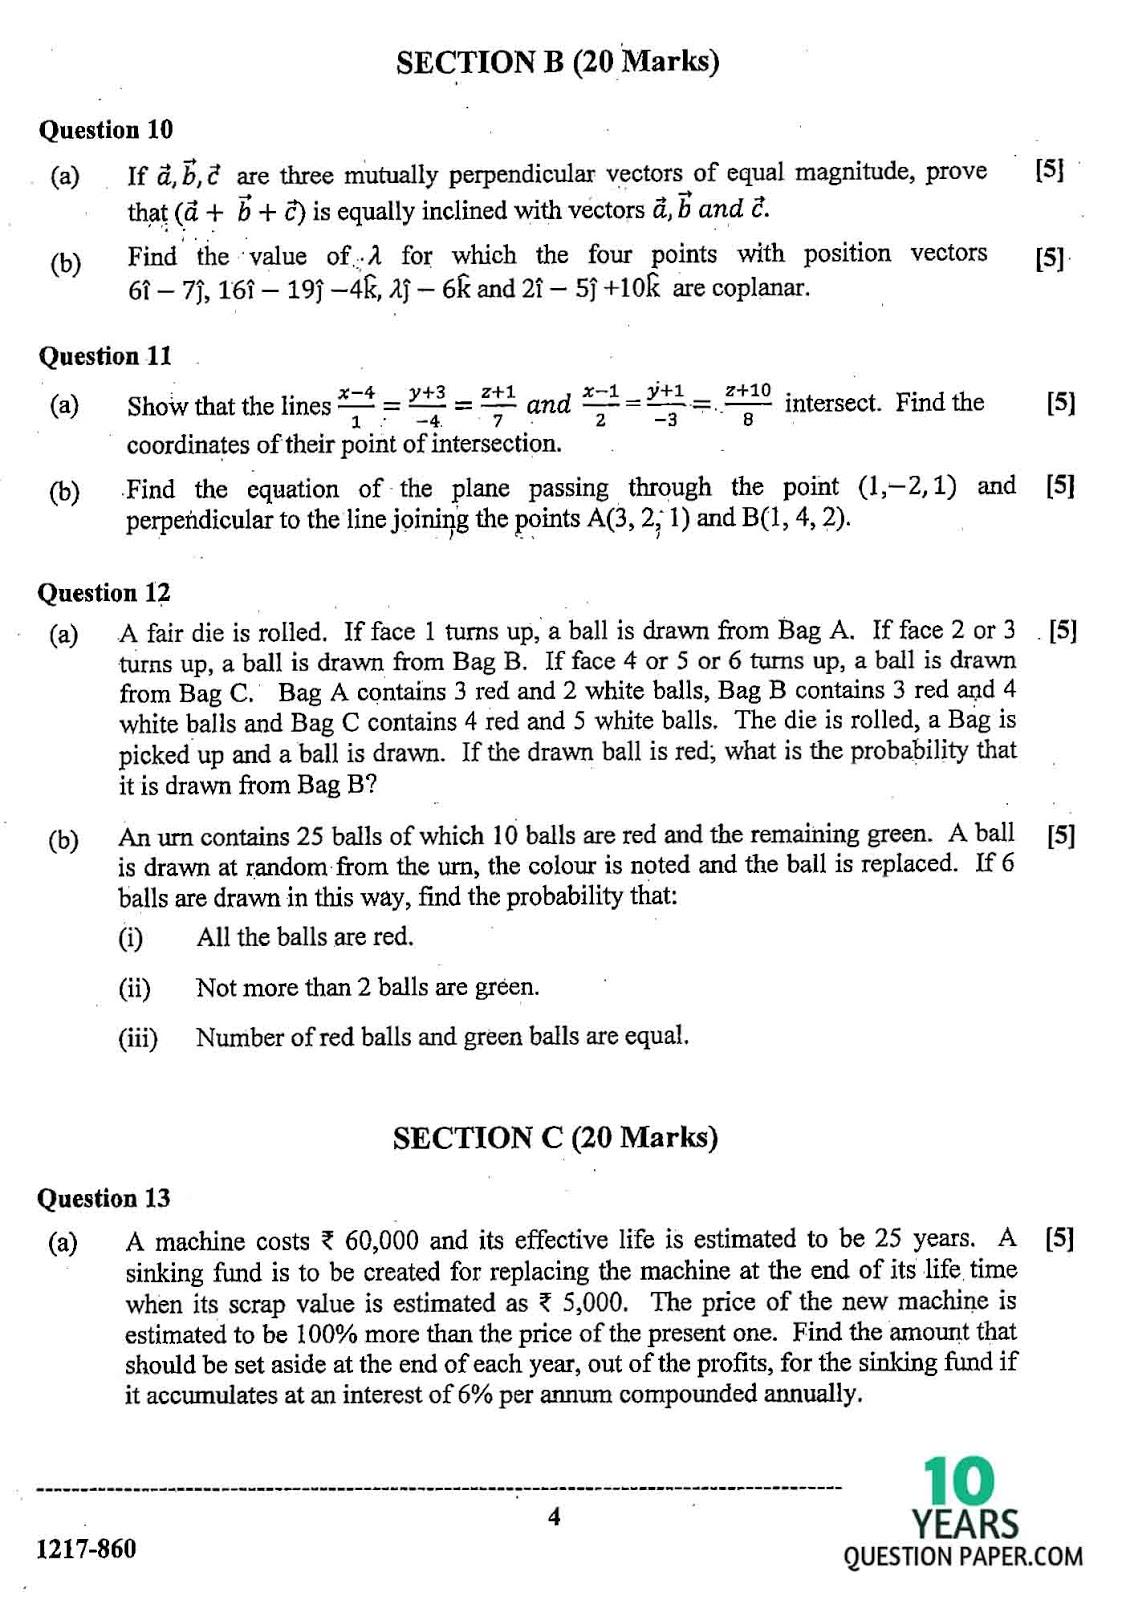 isc 2017 class 12th Mathematics question paper